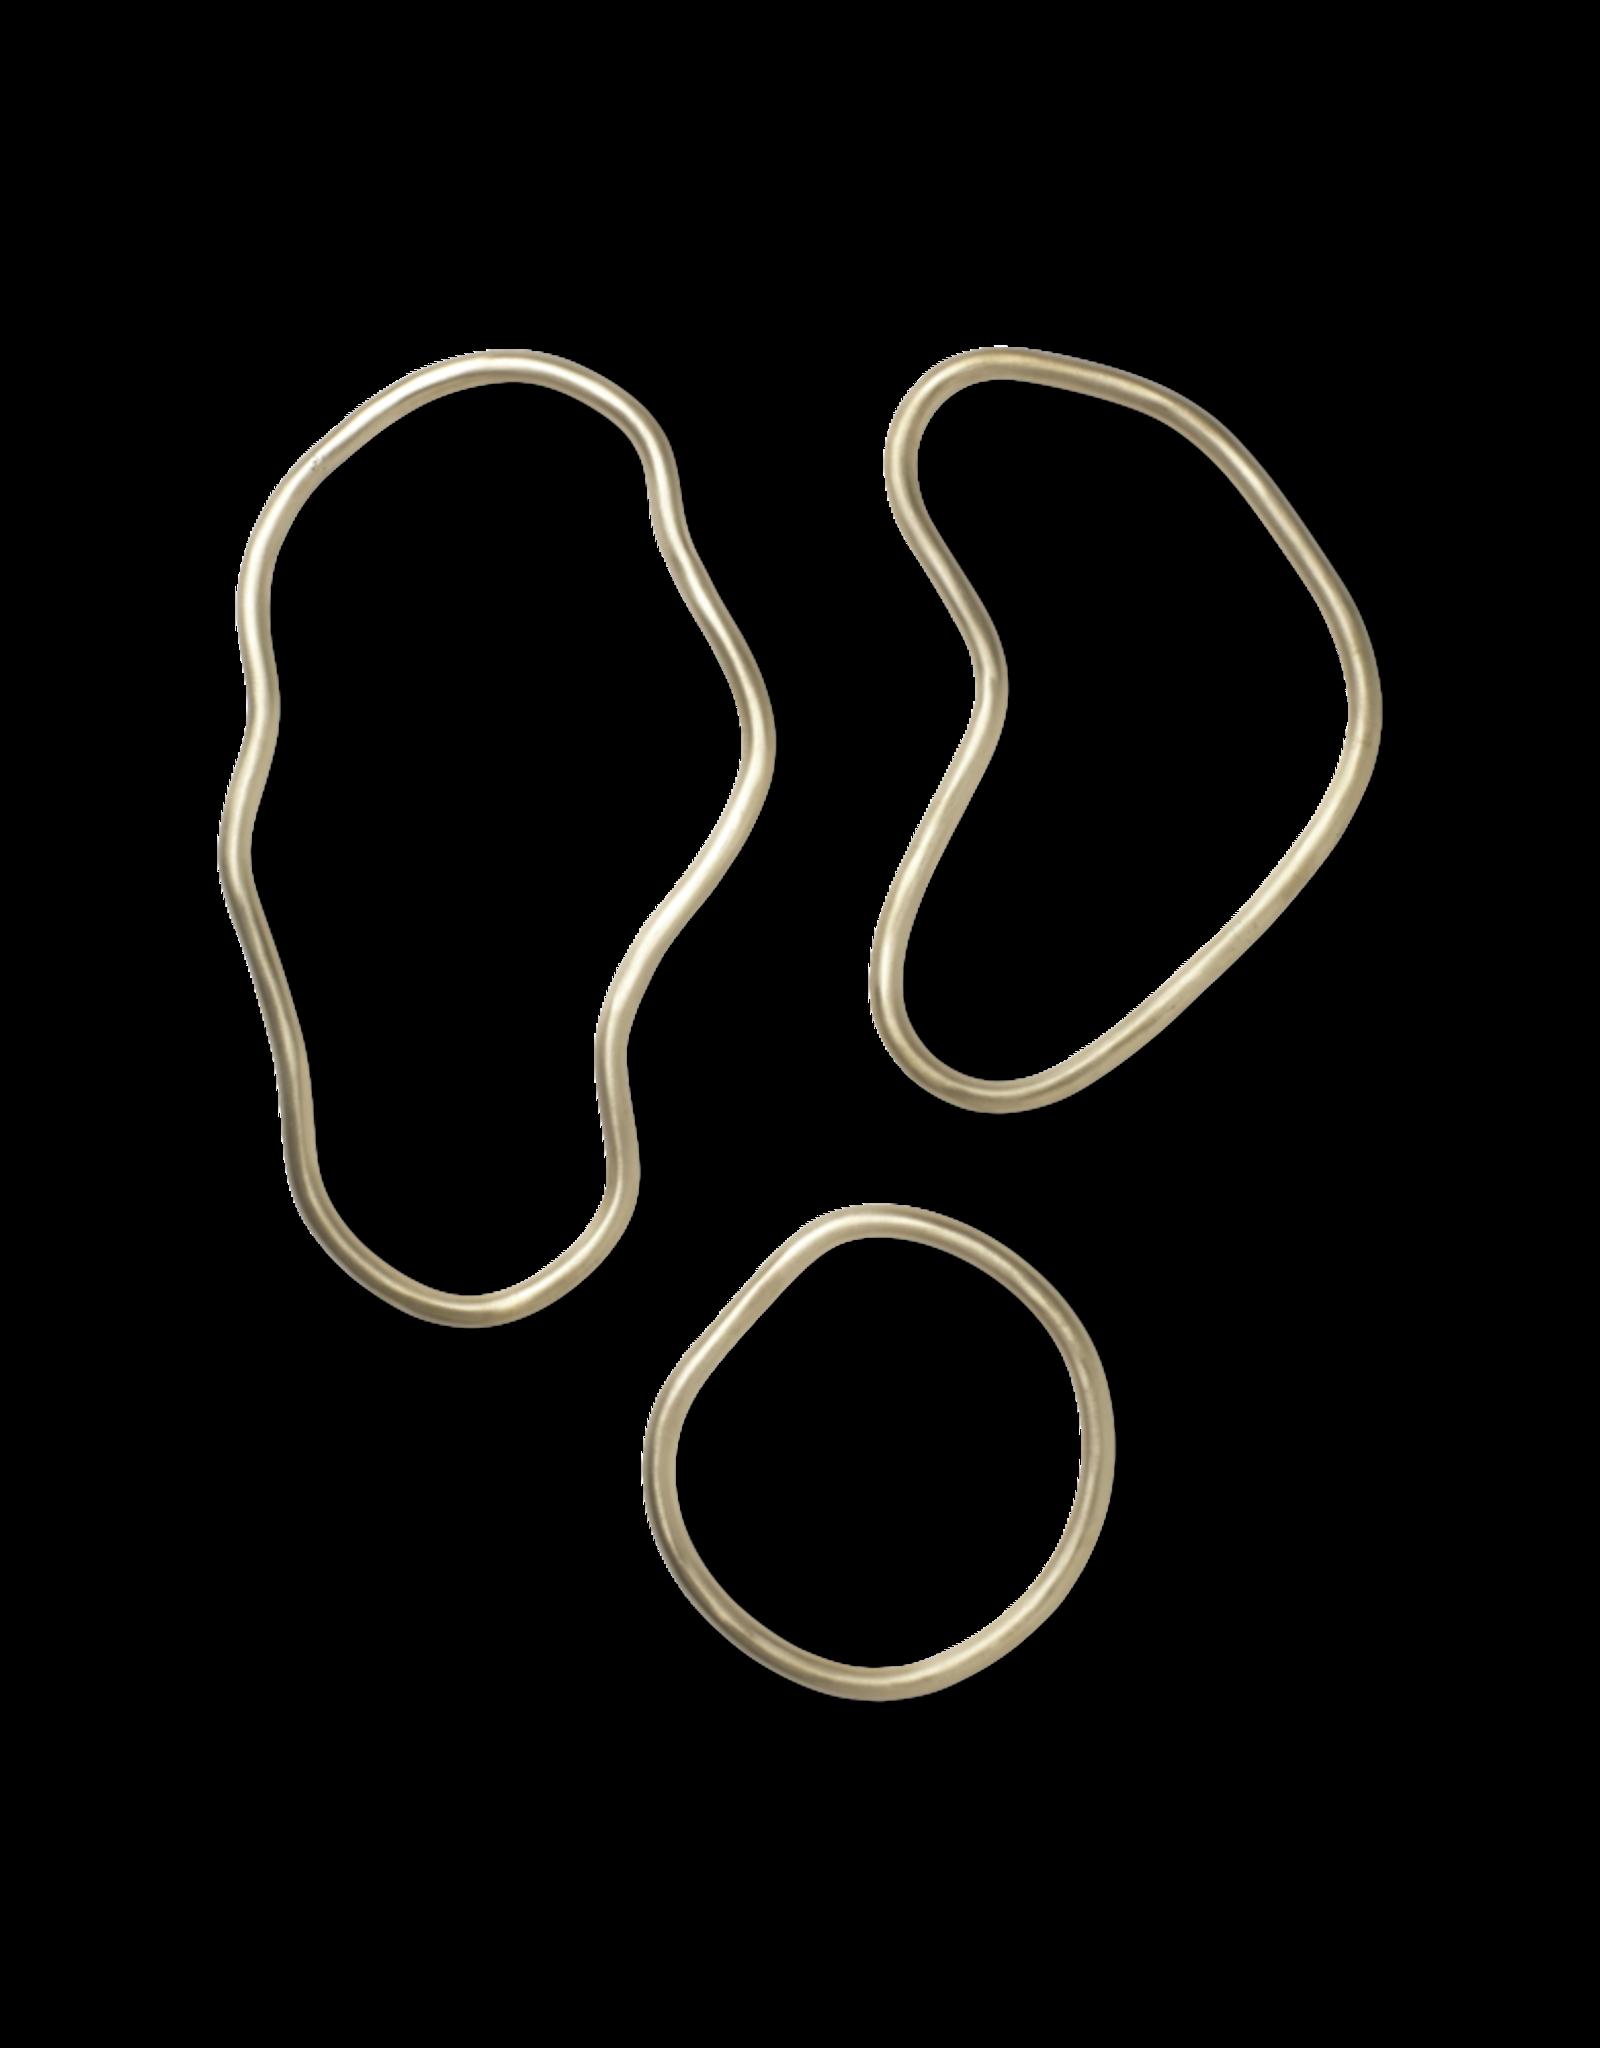 FERM LIVING Pond Trivets - Set of 3 Brass